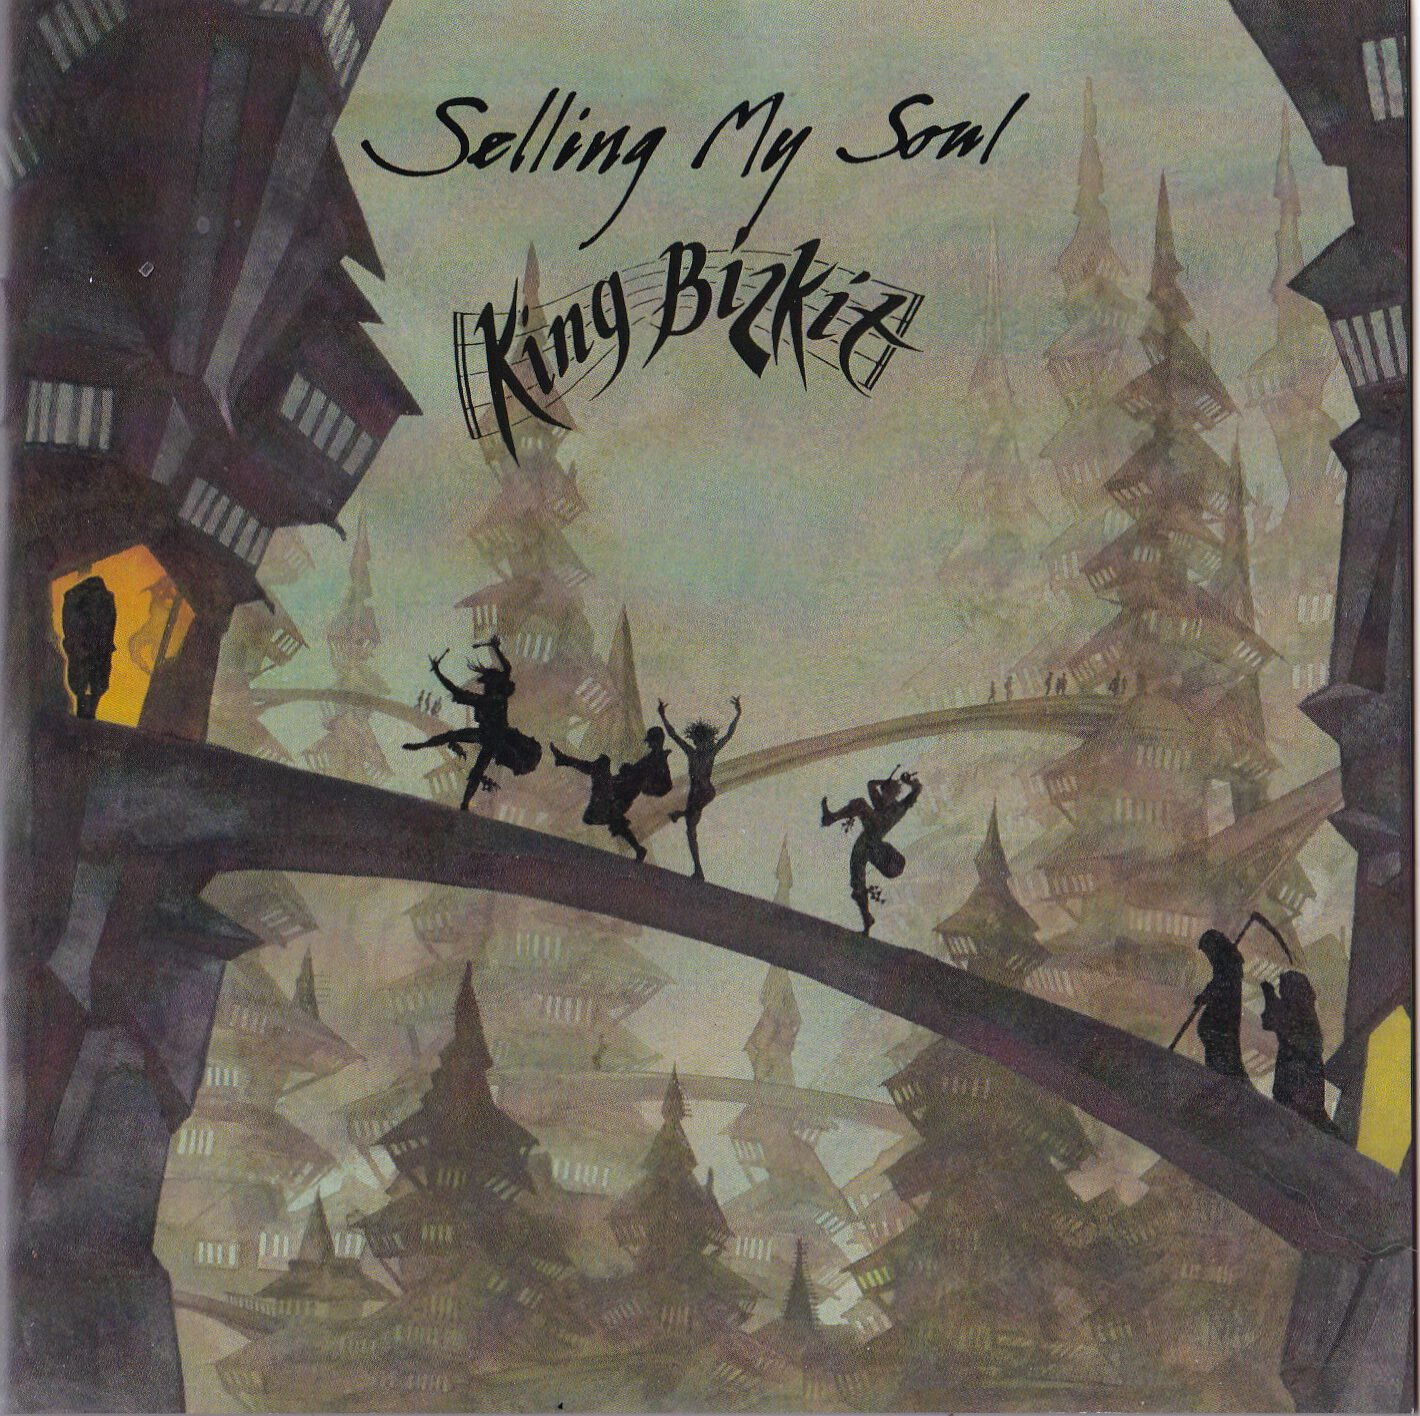 King Bizkit - Selling My Soul